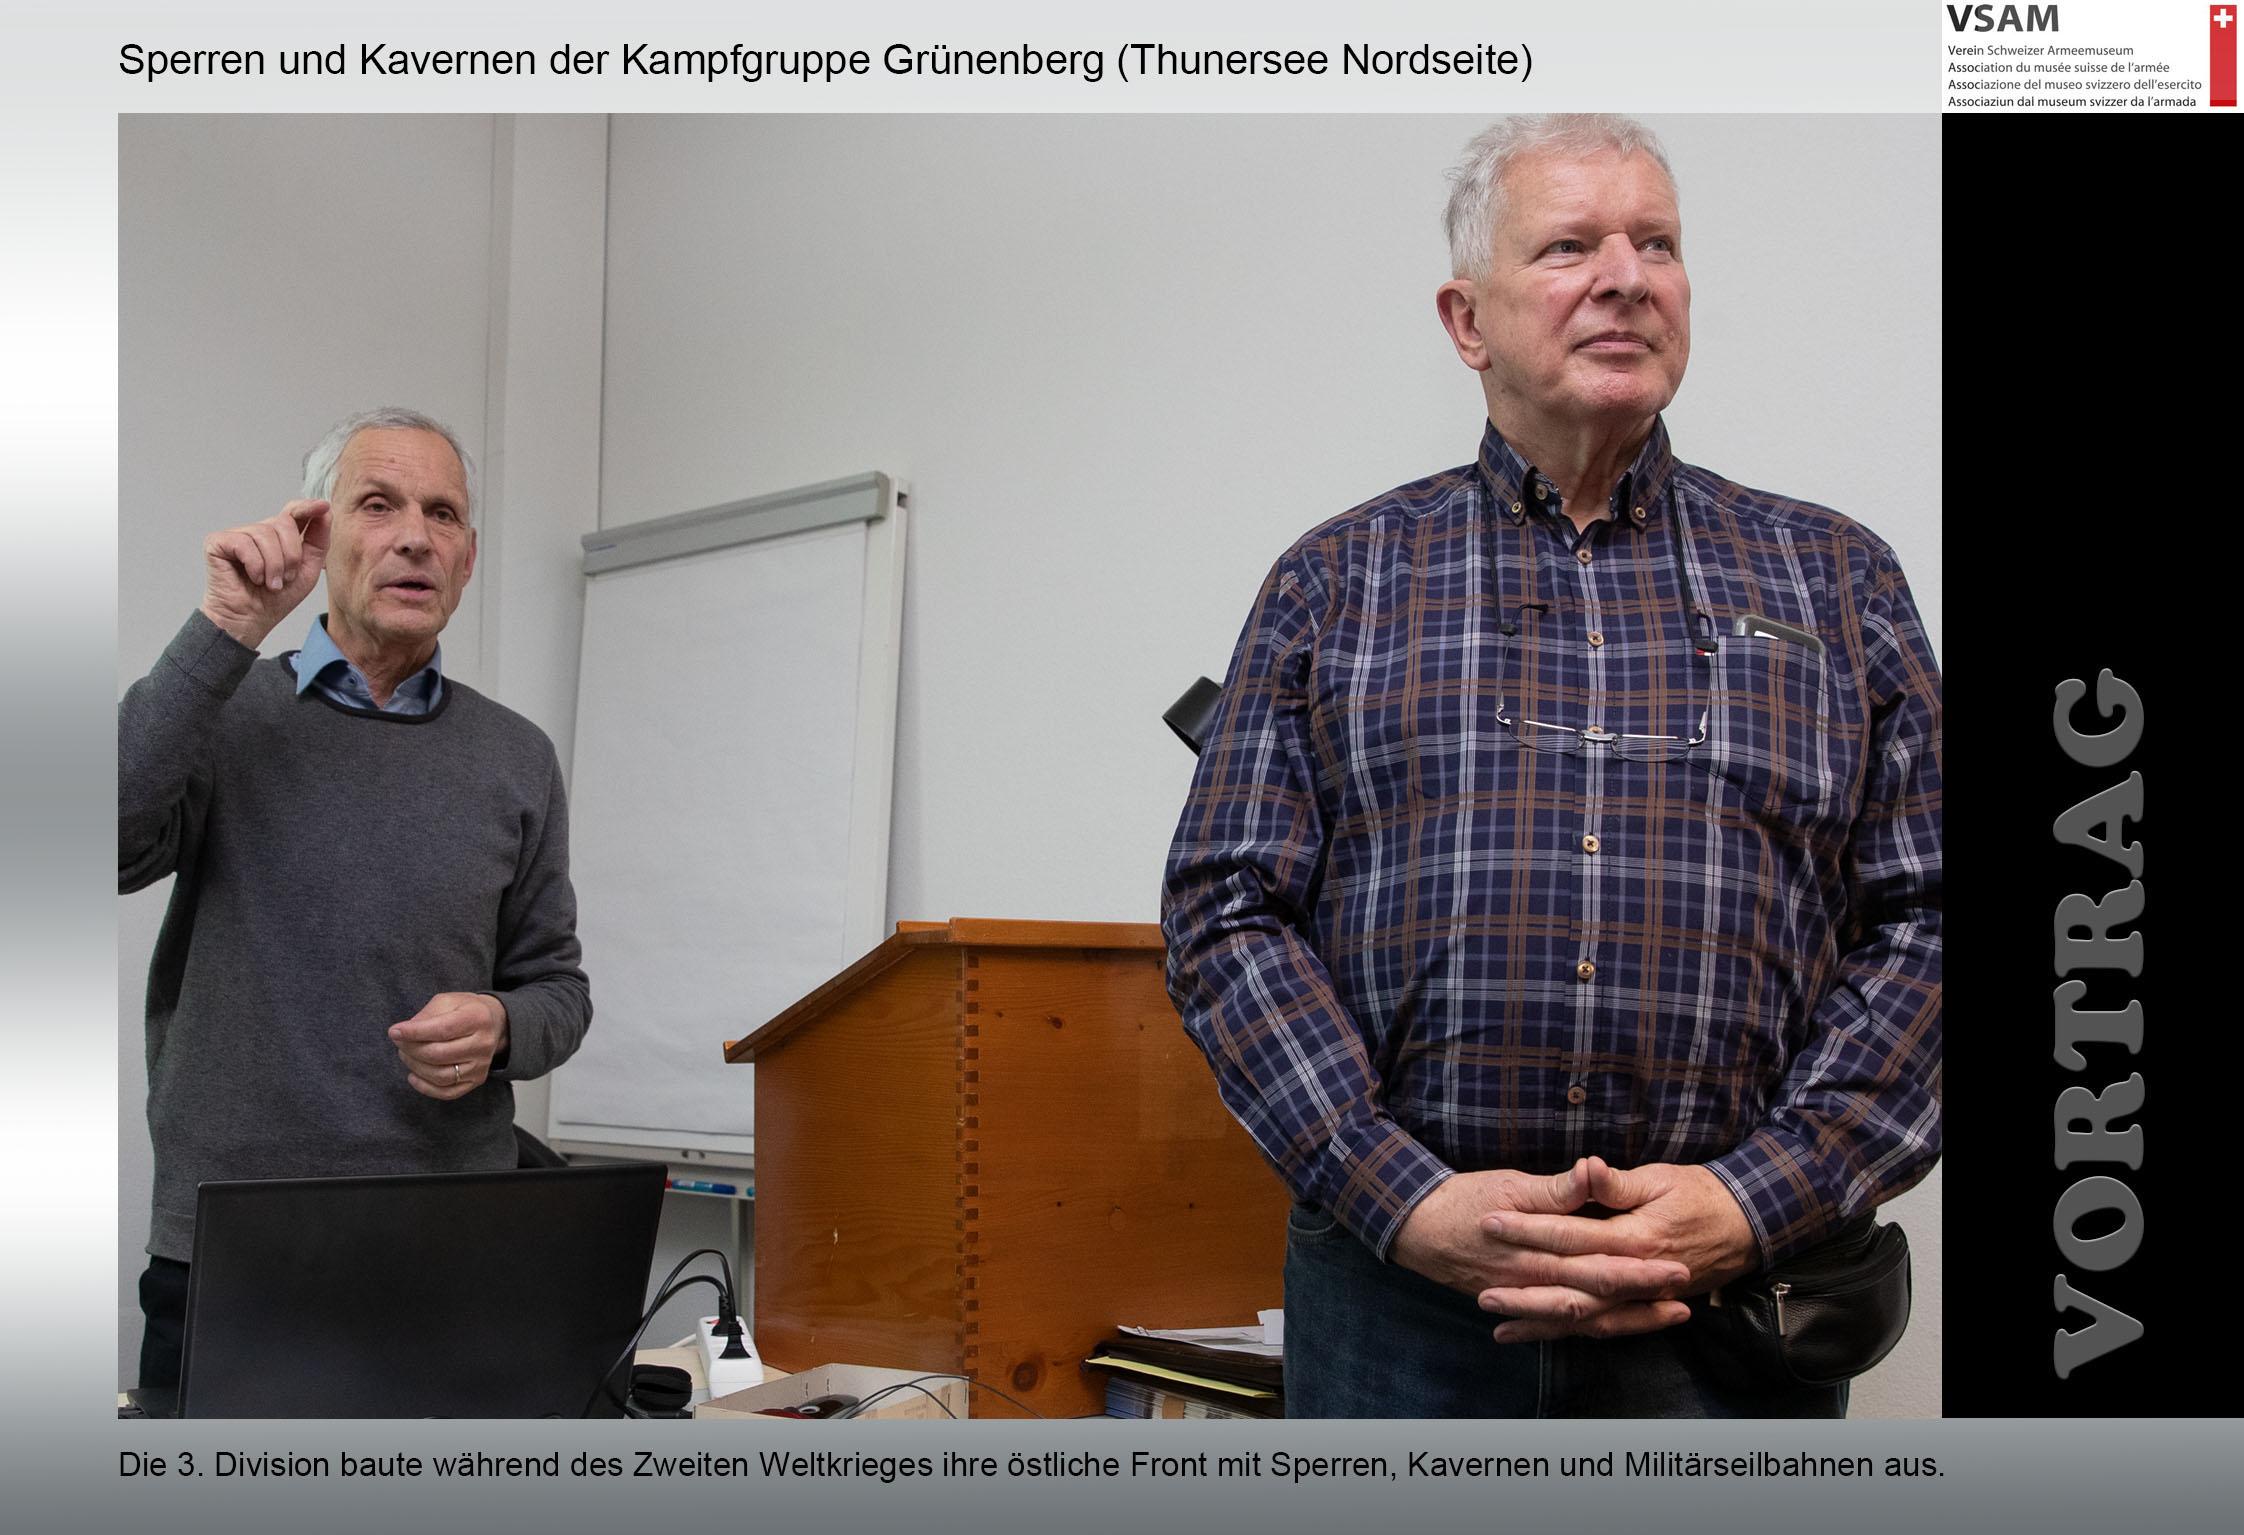 Sperren und Kavernen der Kampfgruppe Grünenberg (Thunersee Nord